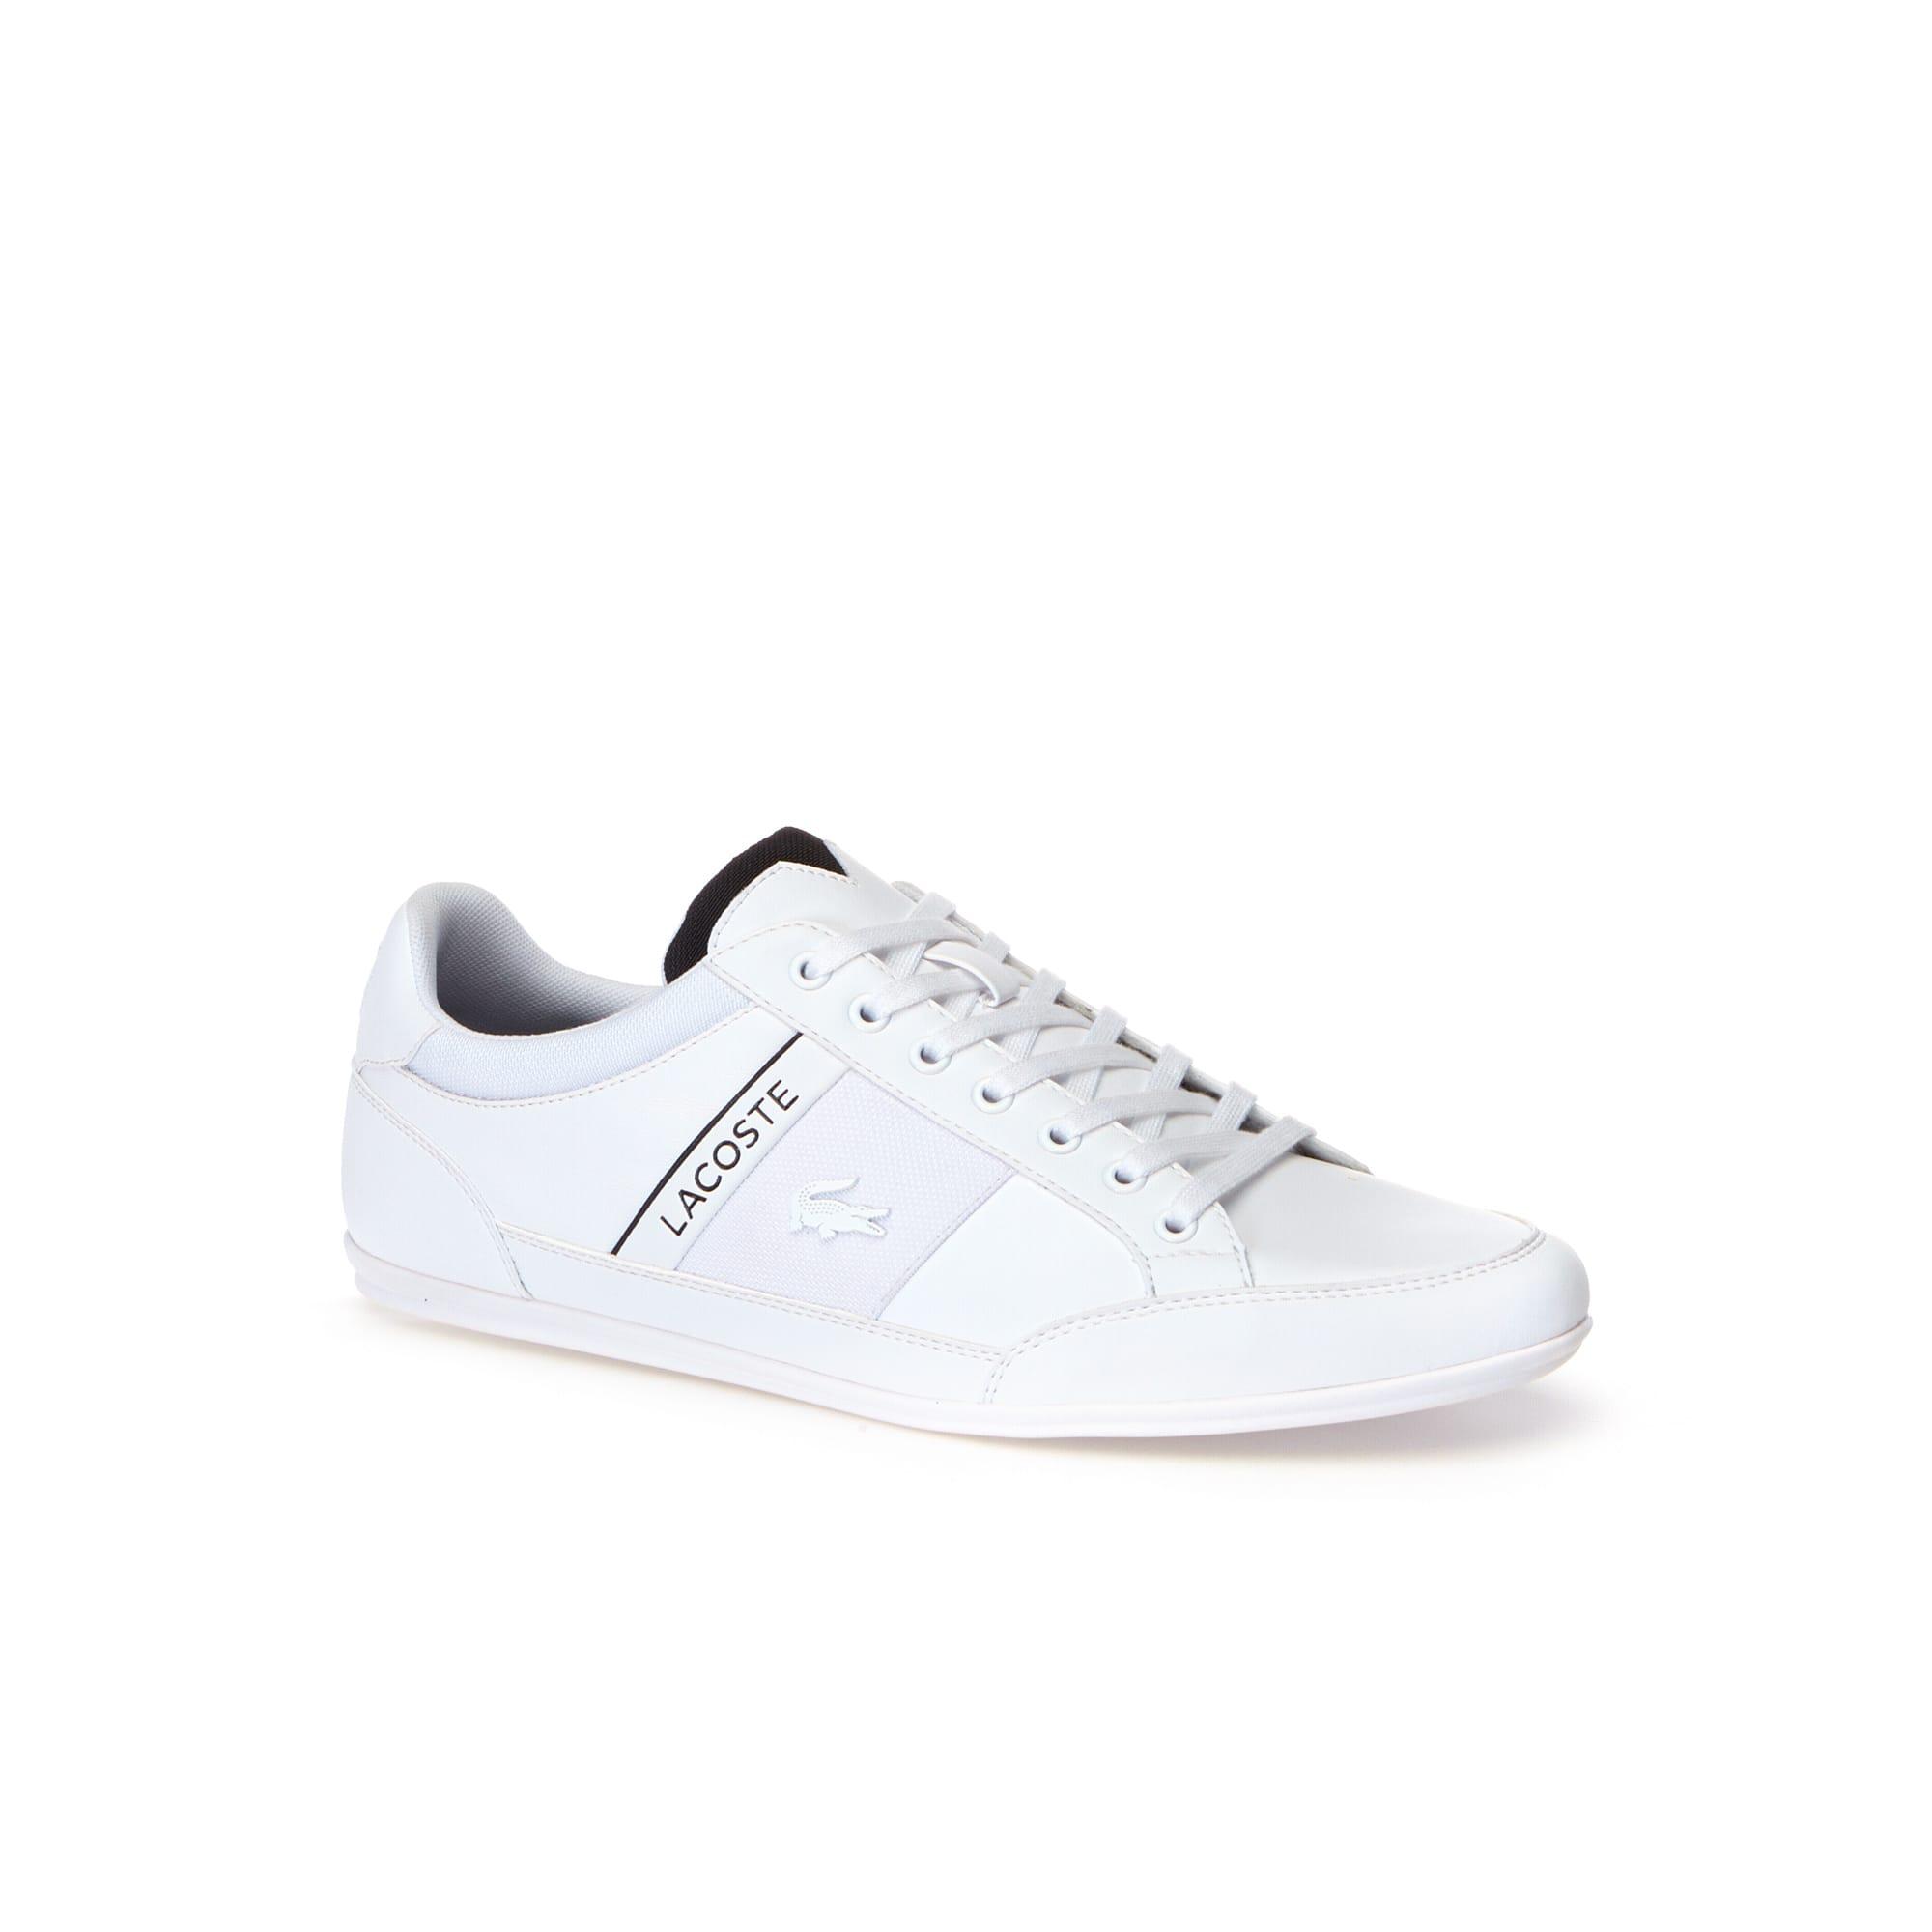 d949b4f57c3 Calçados masculinos Lacoste  Sneakers